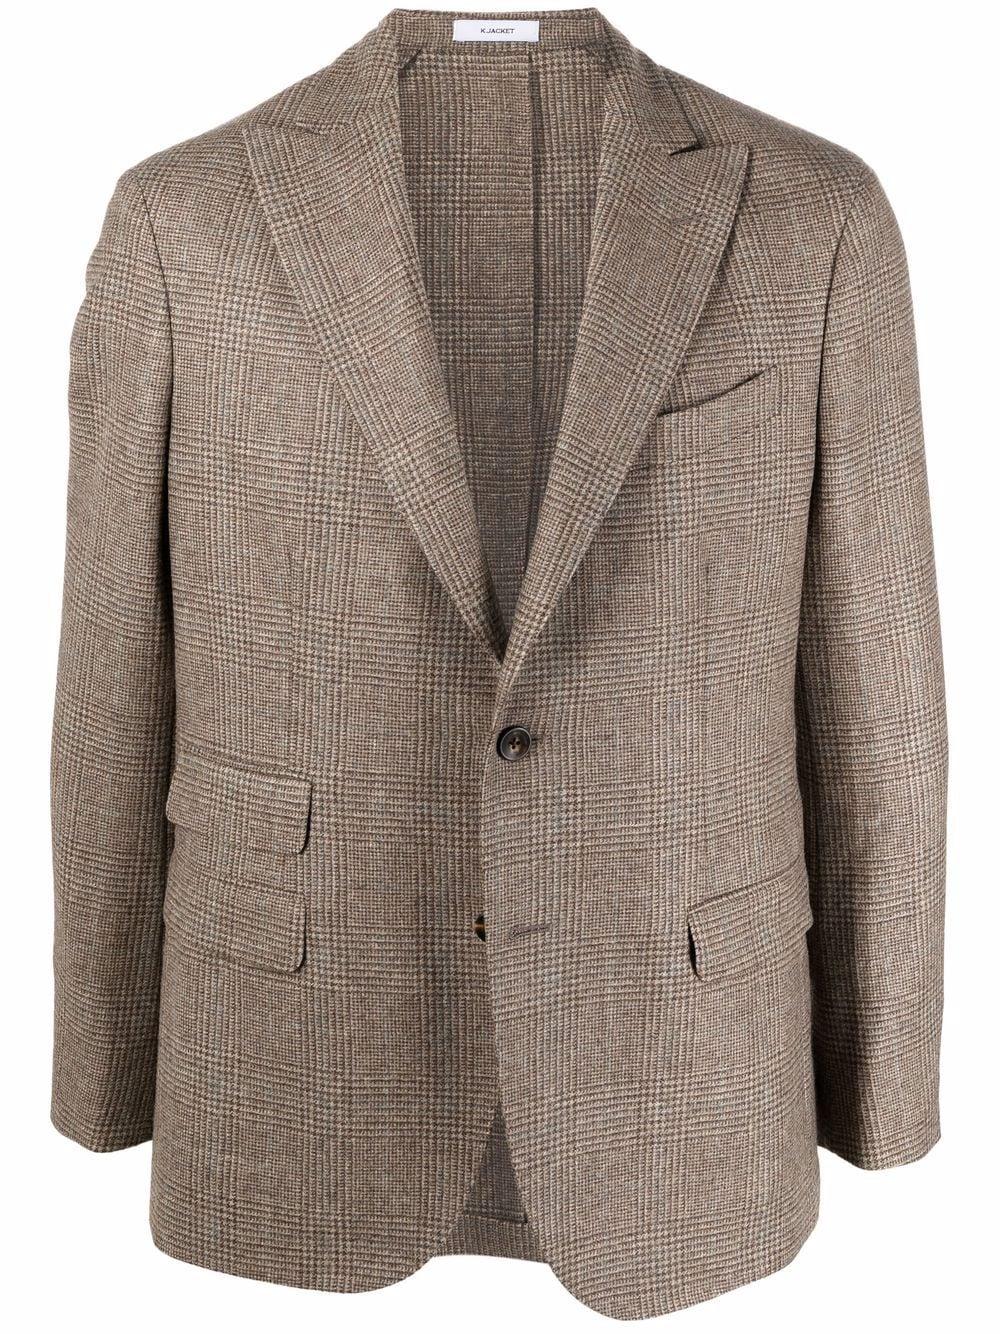 BOGLIOLI- Wool Jacket- Man- 54 - Beige